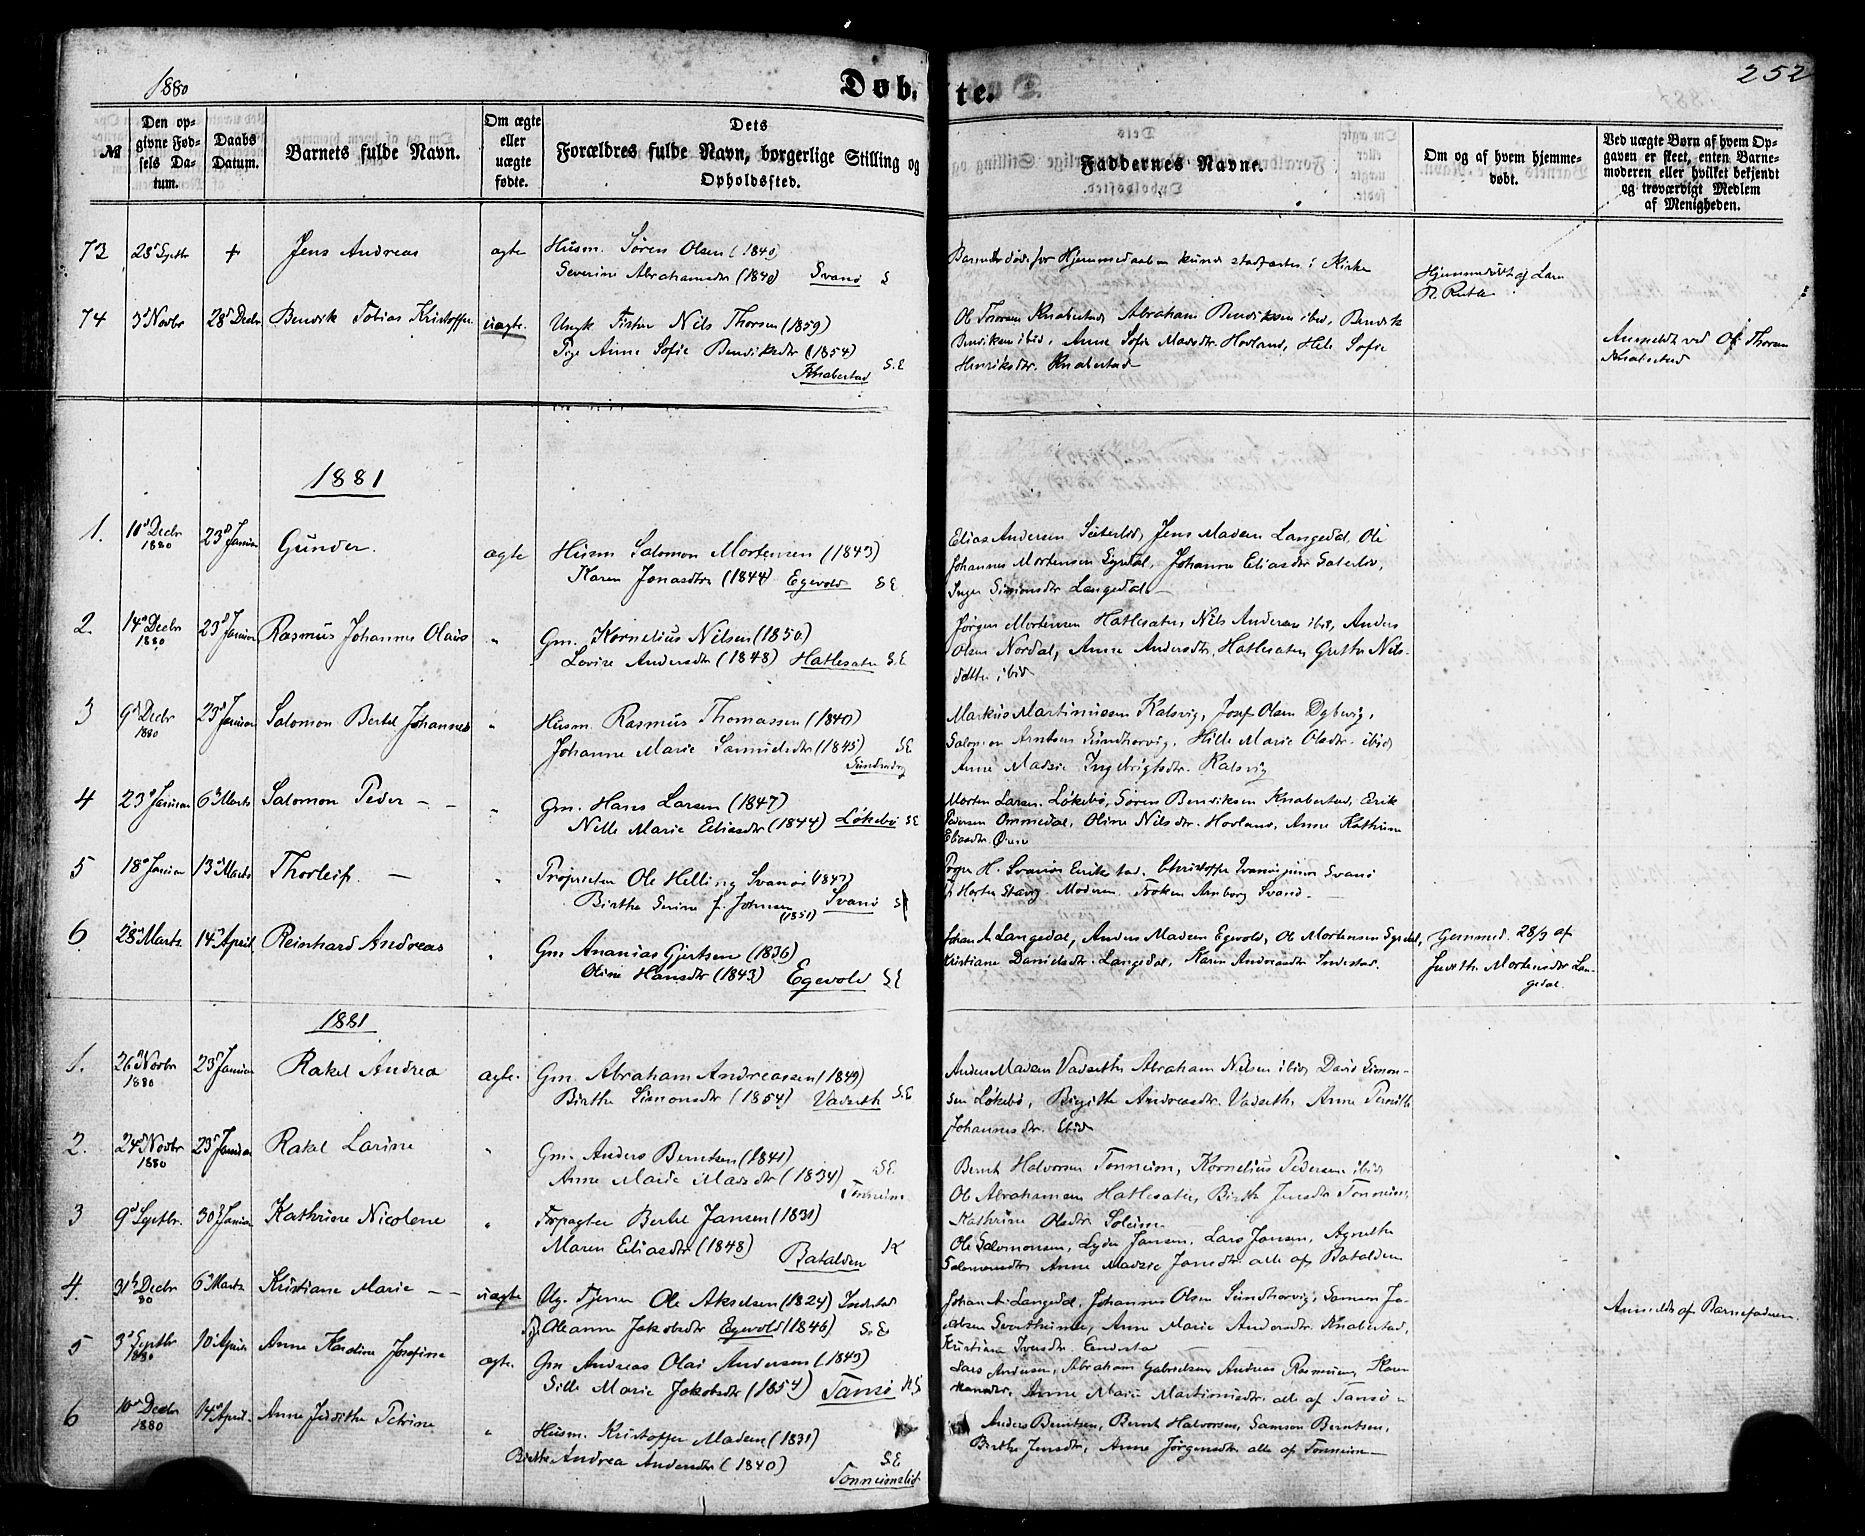 SAB, Kinn sokneprestembete, H/Haa/Haaa/L0006: Parish register (official) no. A 6, 1857-1885, p. 252